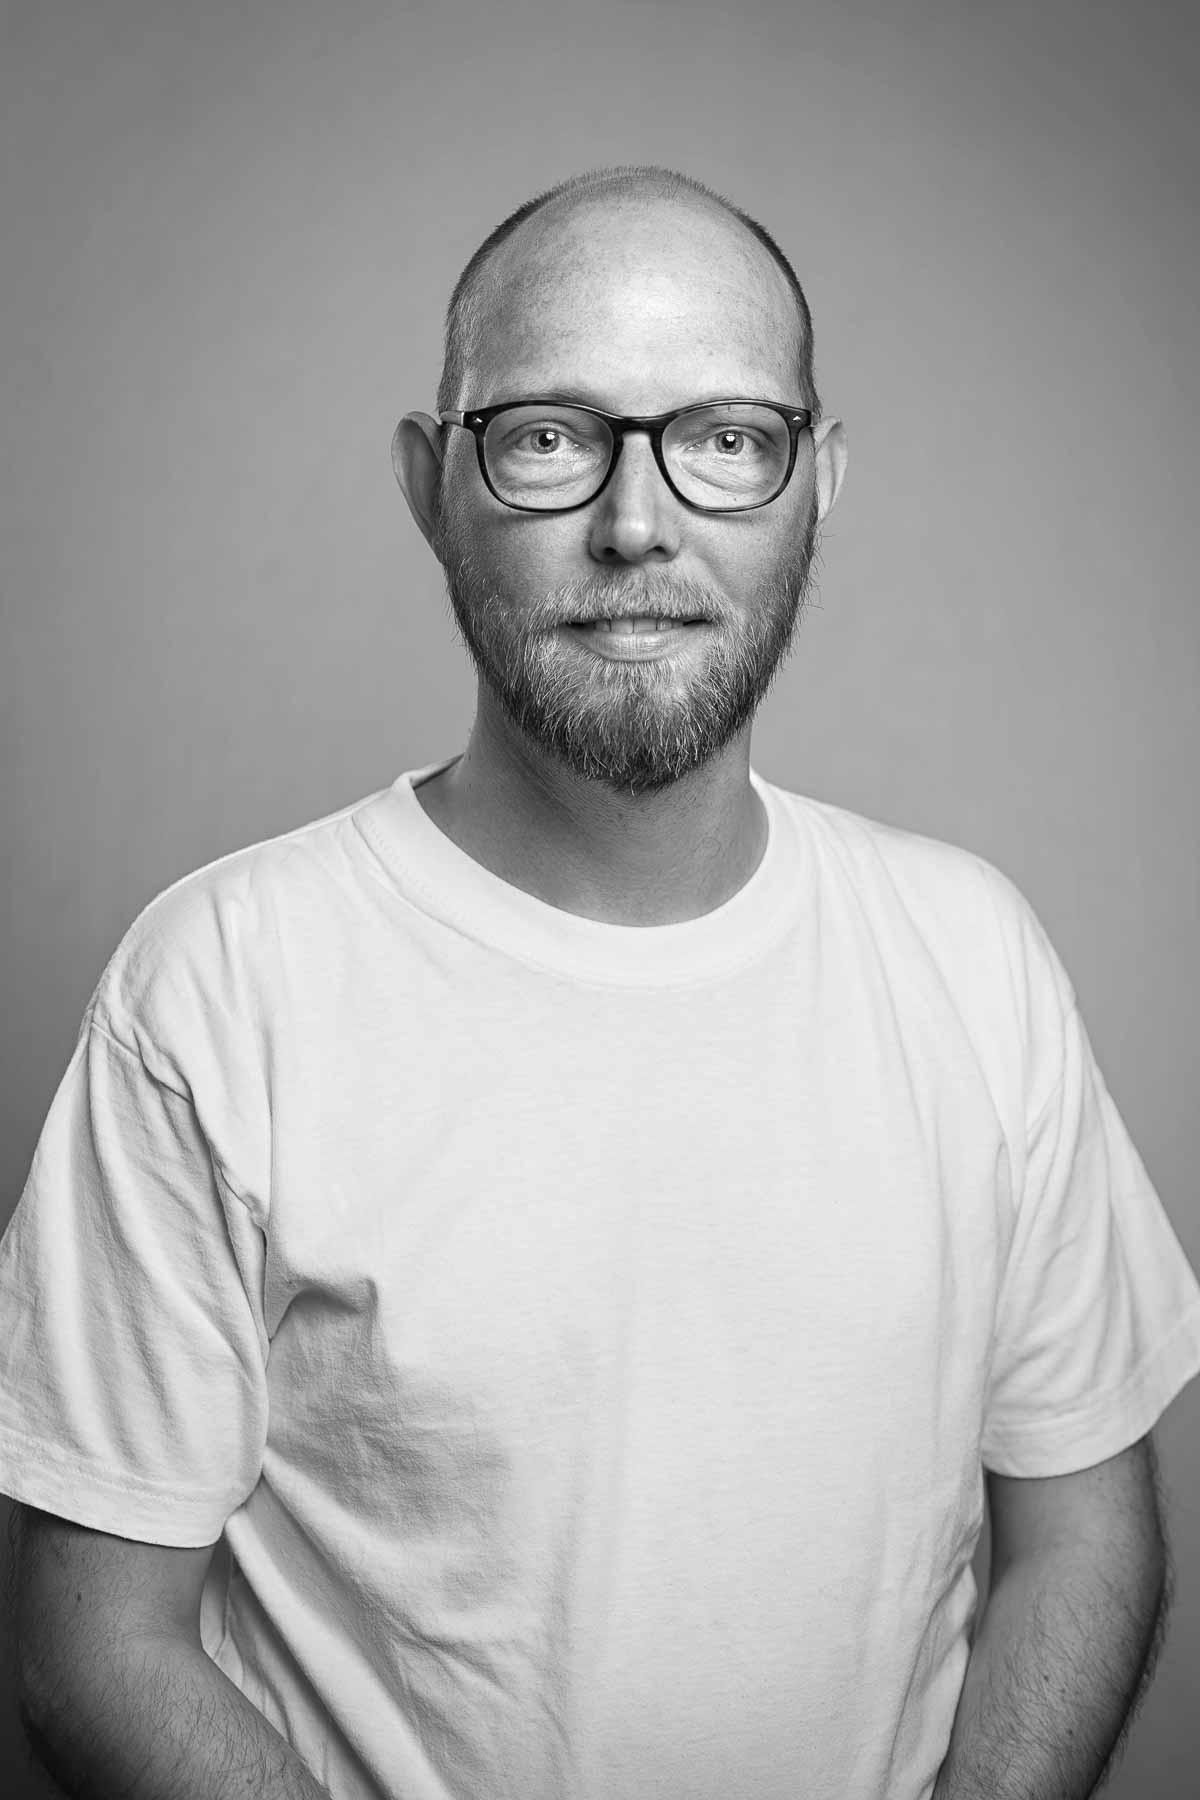 medarbejderportræt+aarhus+fotograf